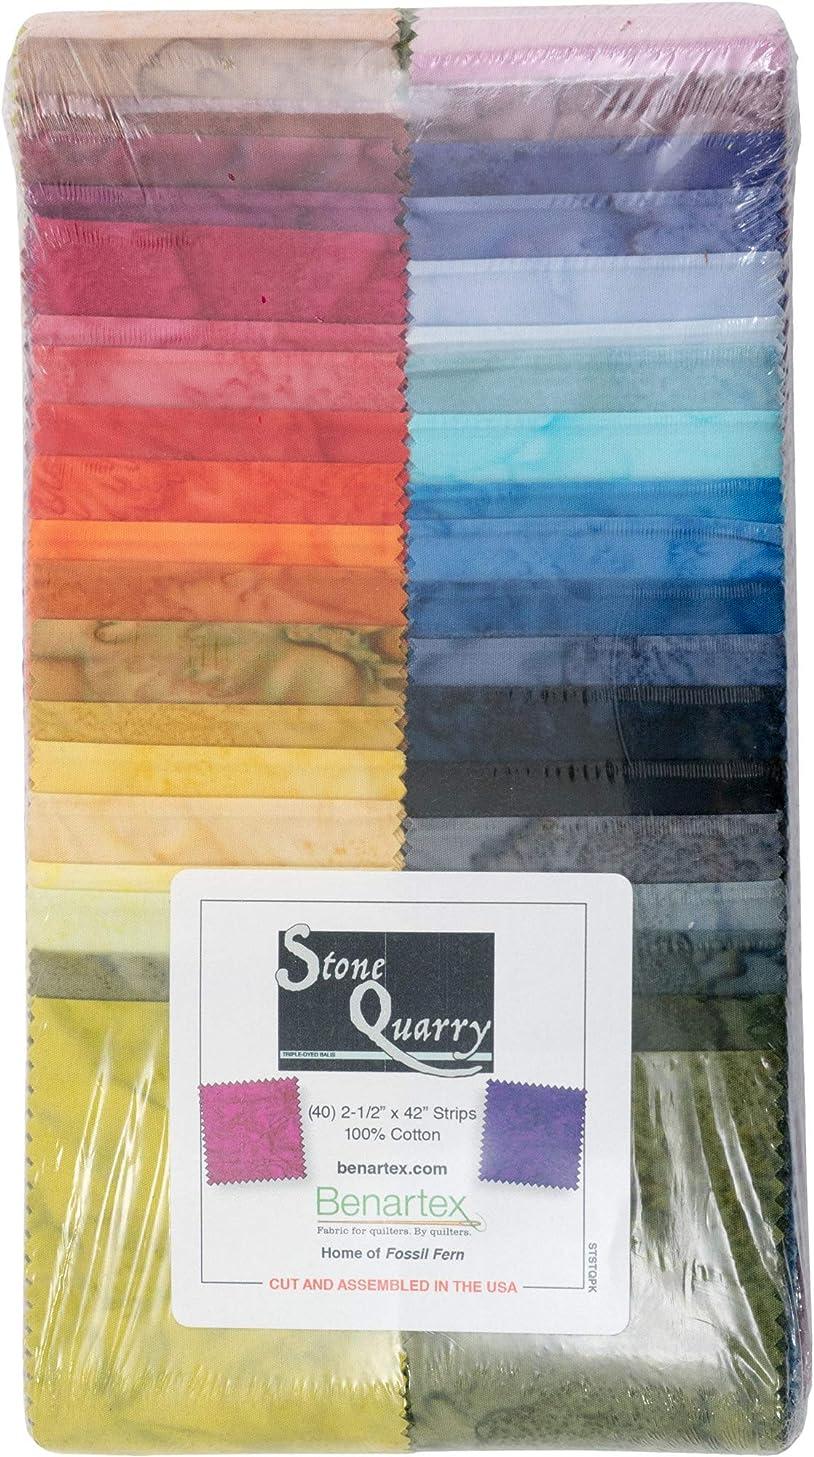 Stone Quarry Strip-Pies 40 2.5-inch Strips Jelly Roll Benartex, Assorted